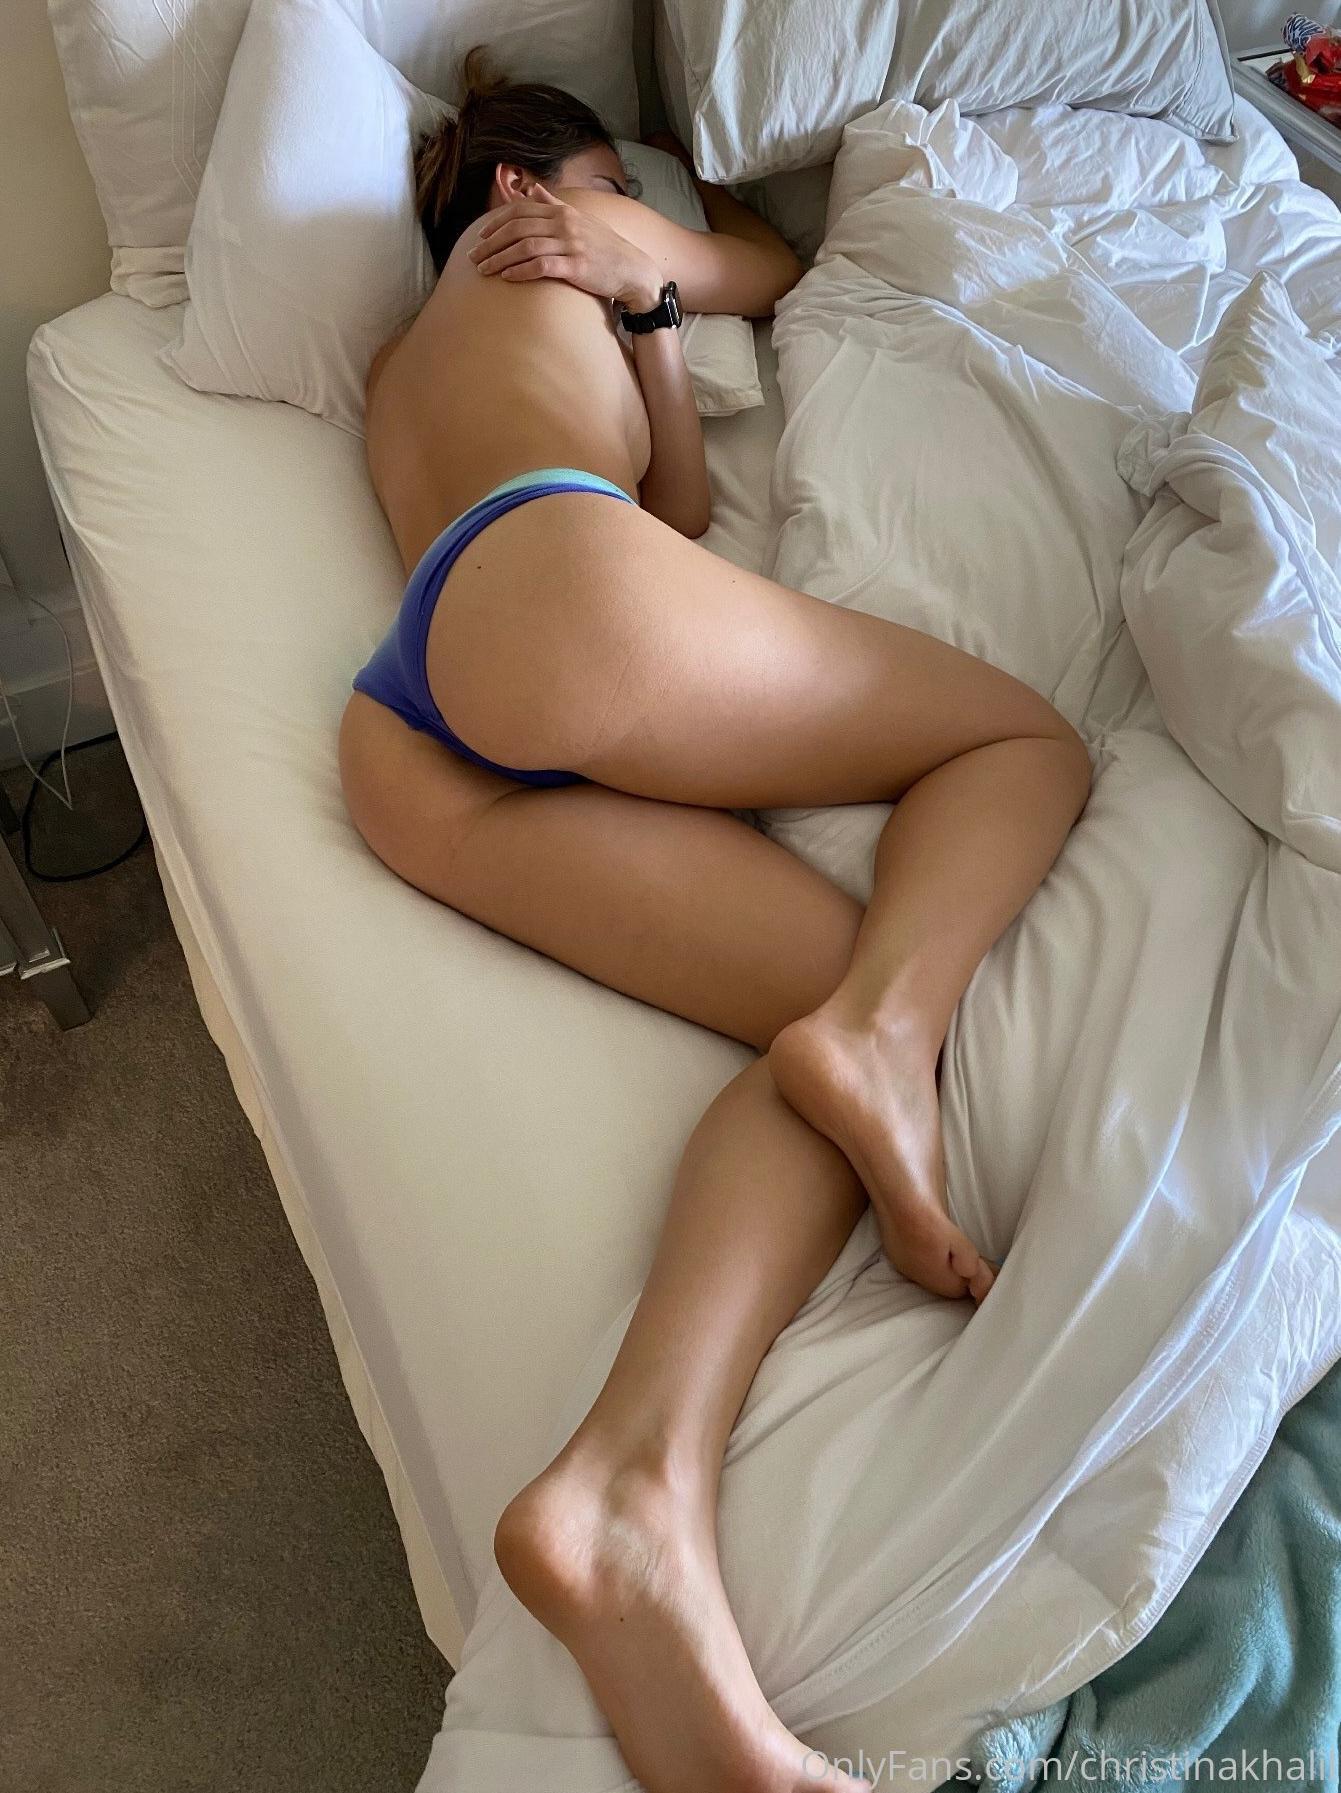 Christina Khalil See Through Lingerie Onlyfans Set Leaked Irsjoi